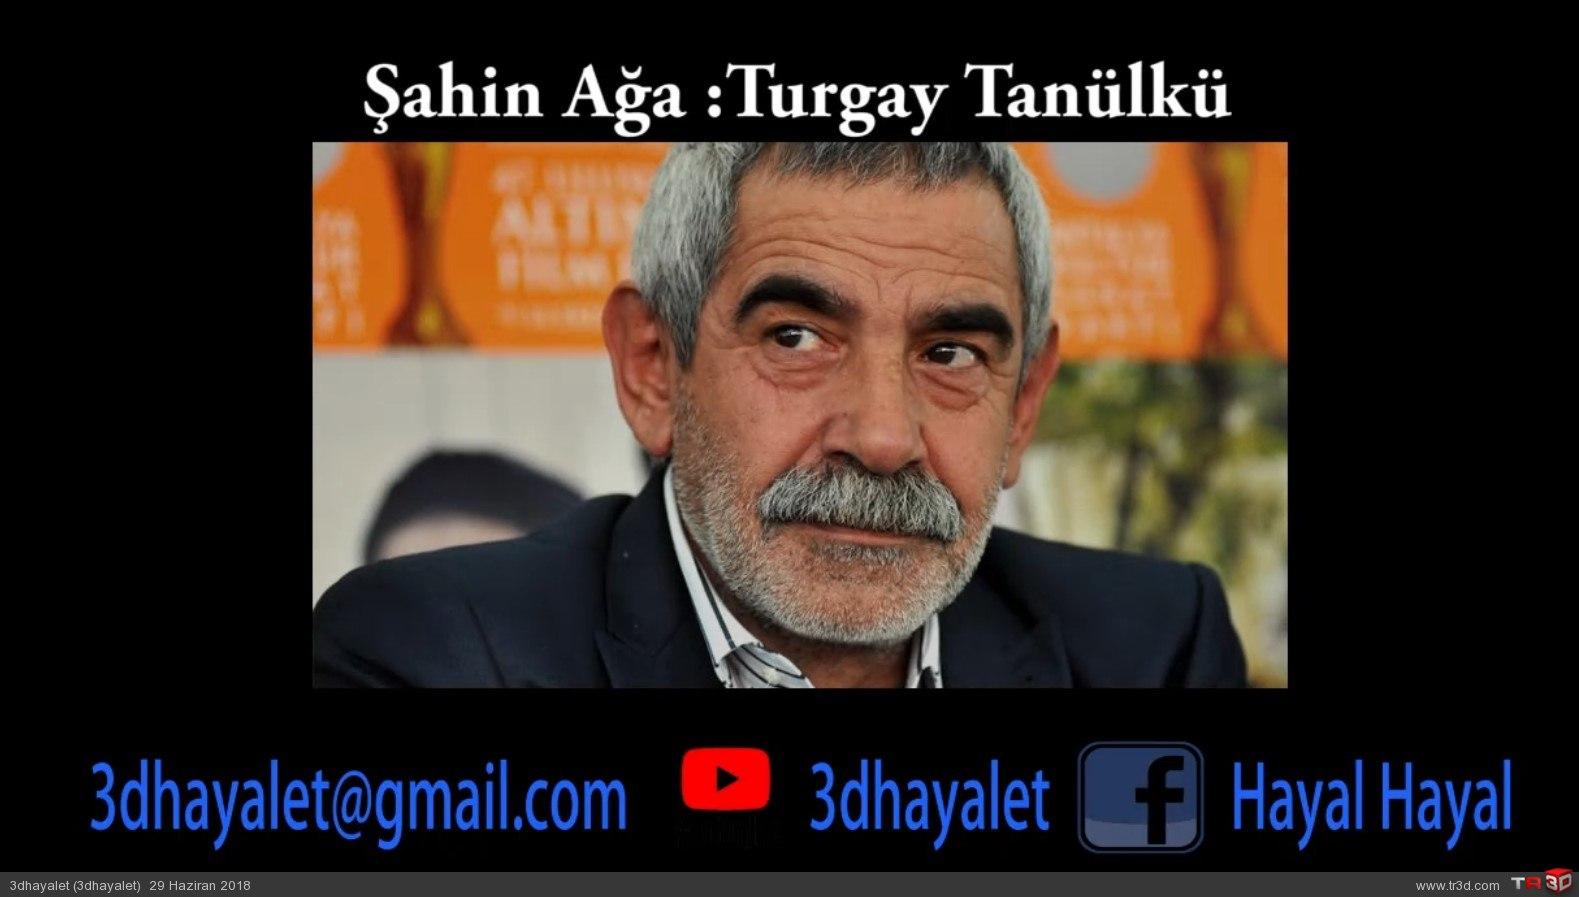 Şahin ağa - Turgay Tanülkü 4